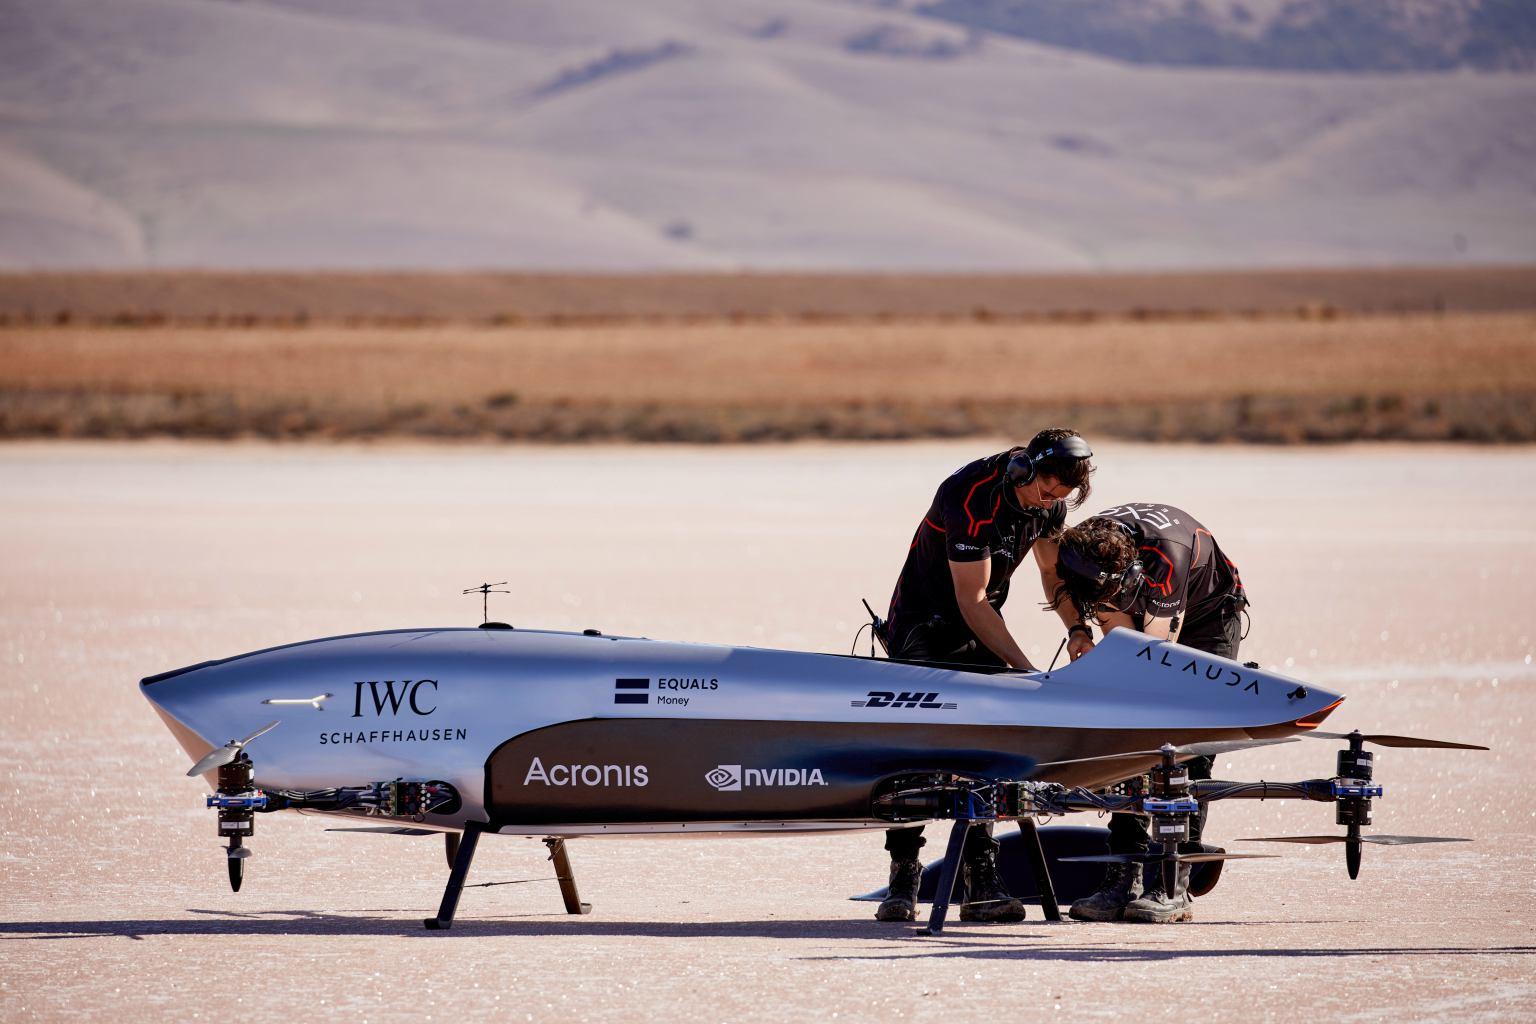 H Airspeeder δίνει ηλεκτρισμό και... φτερά στα αγωνιστικά οχήματα